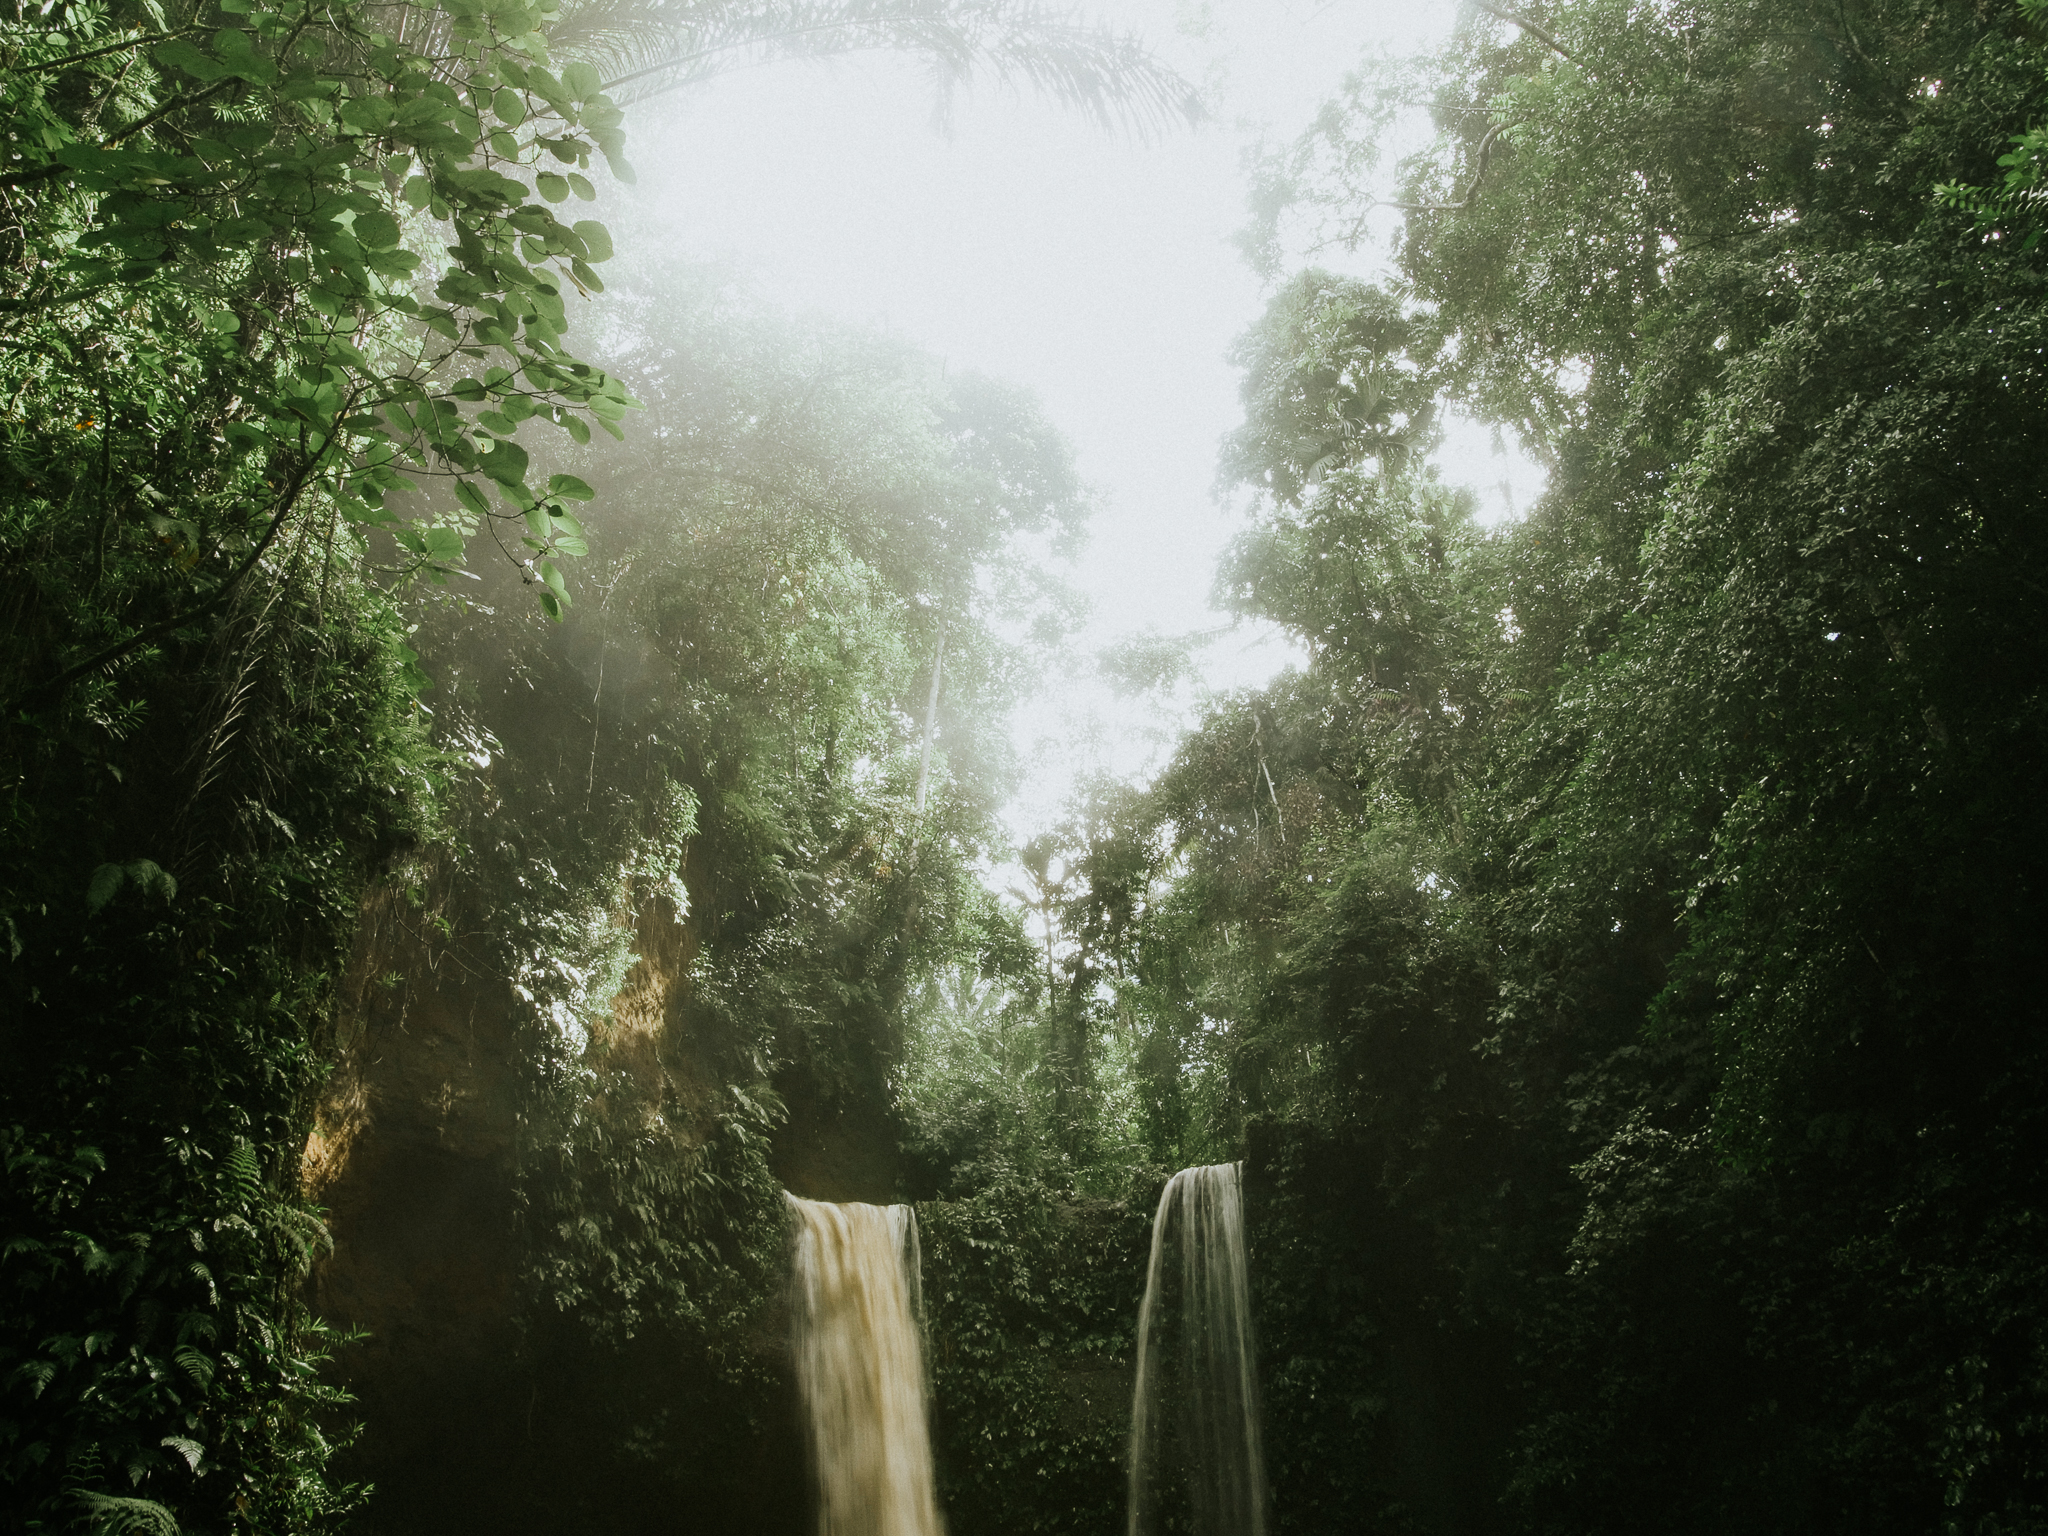 Bali Rainforest Waterfalls